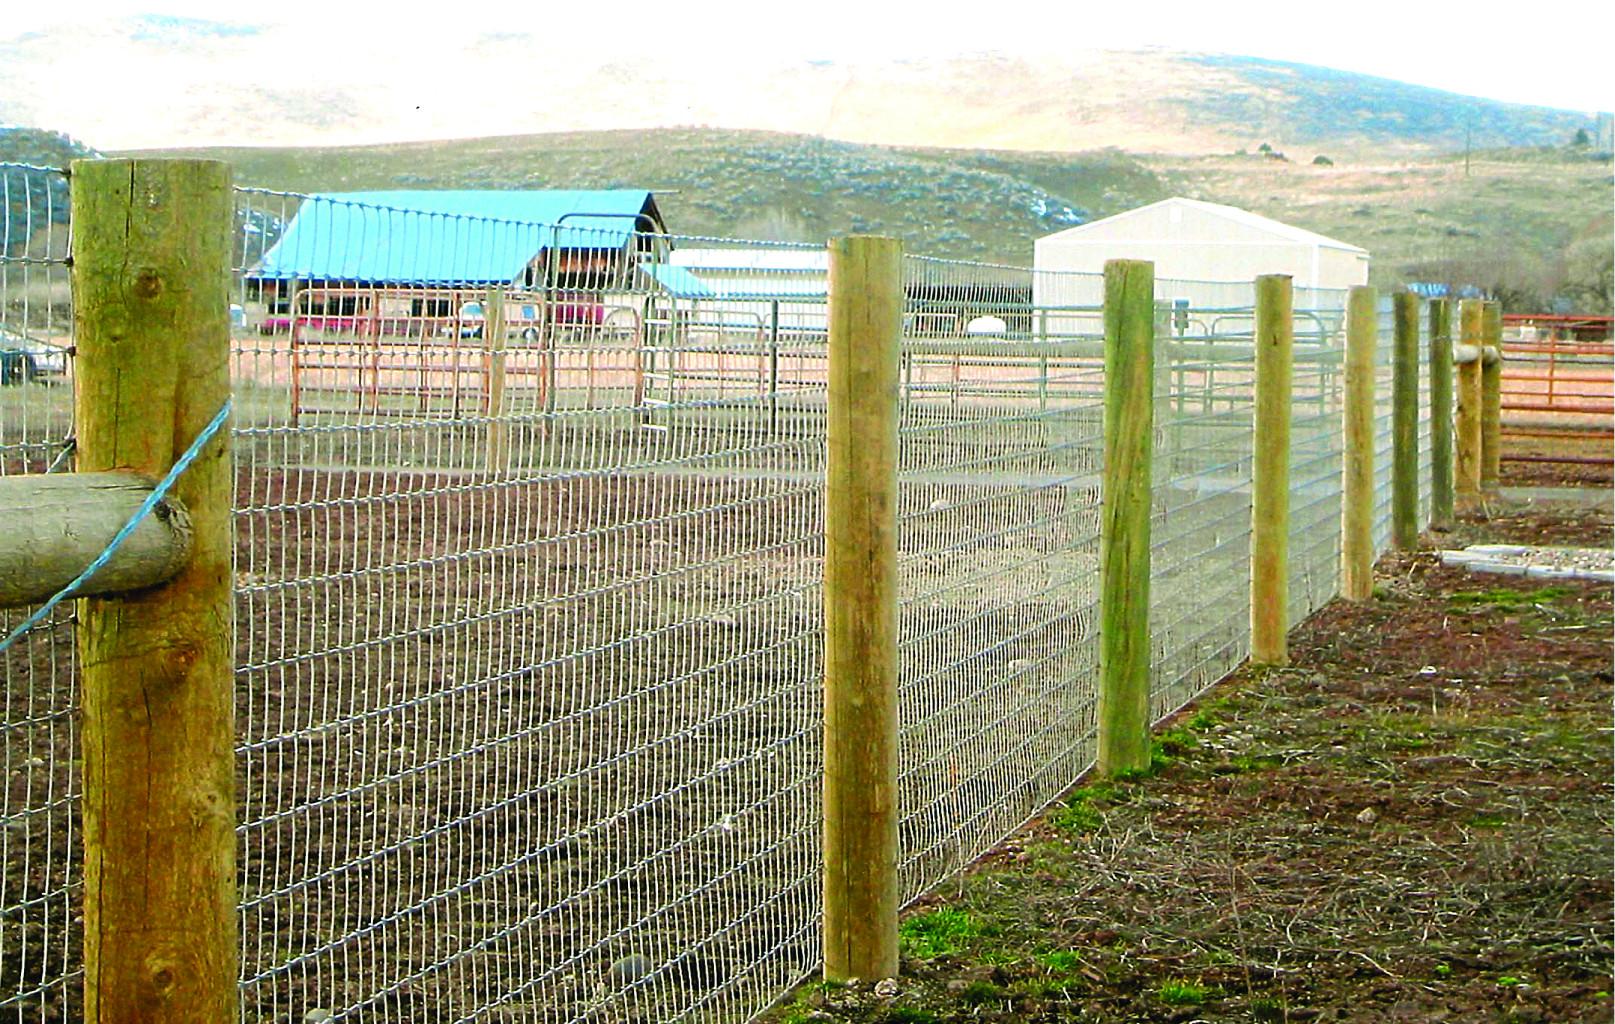 Singleton Fence : AgriculturalFence